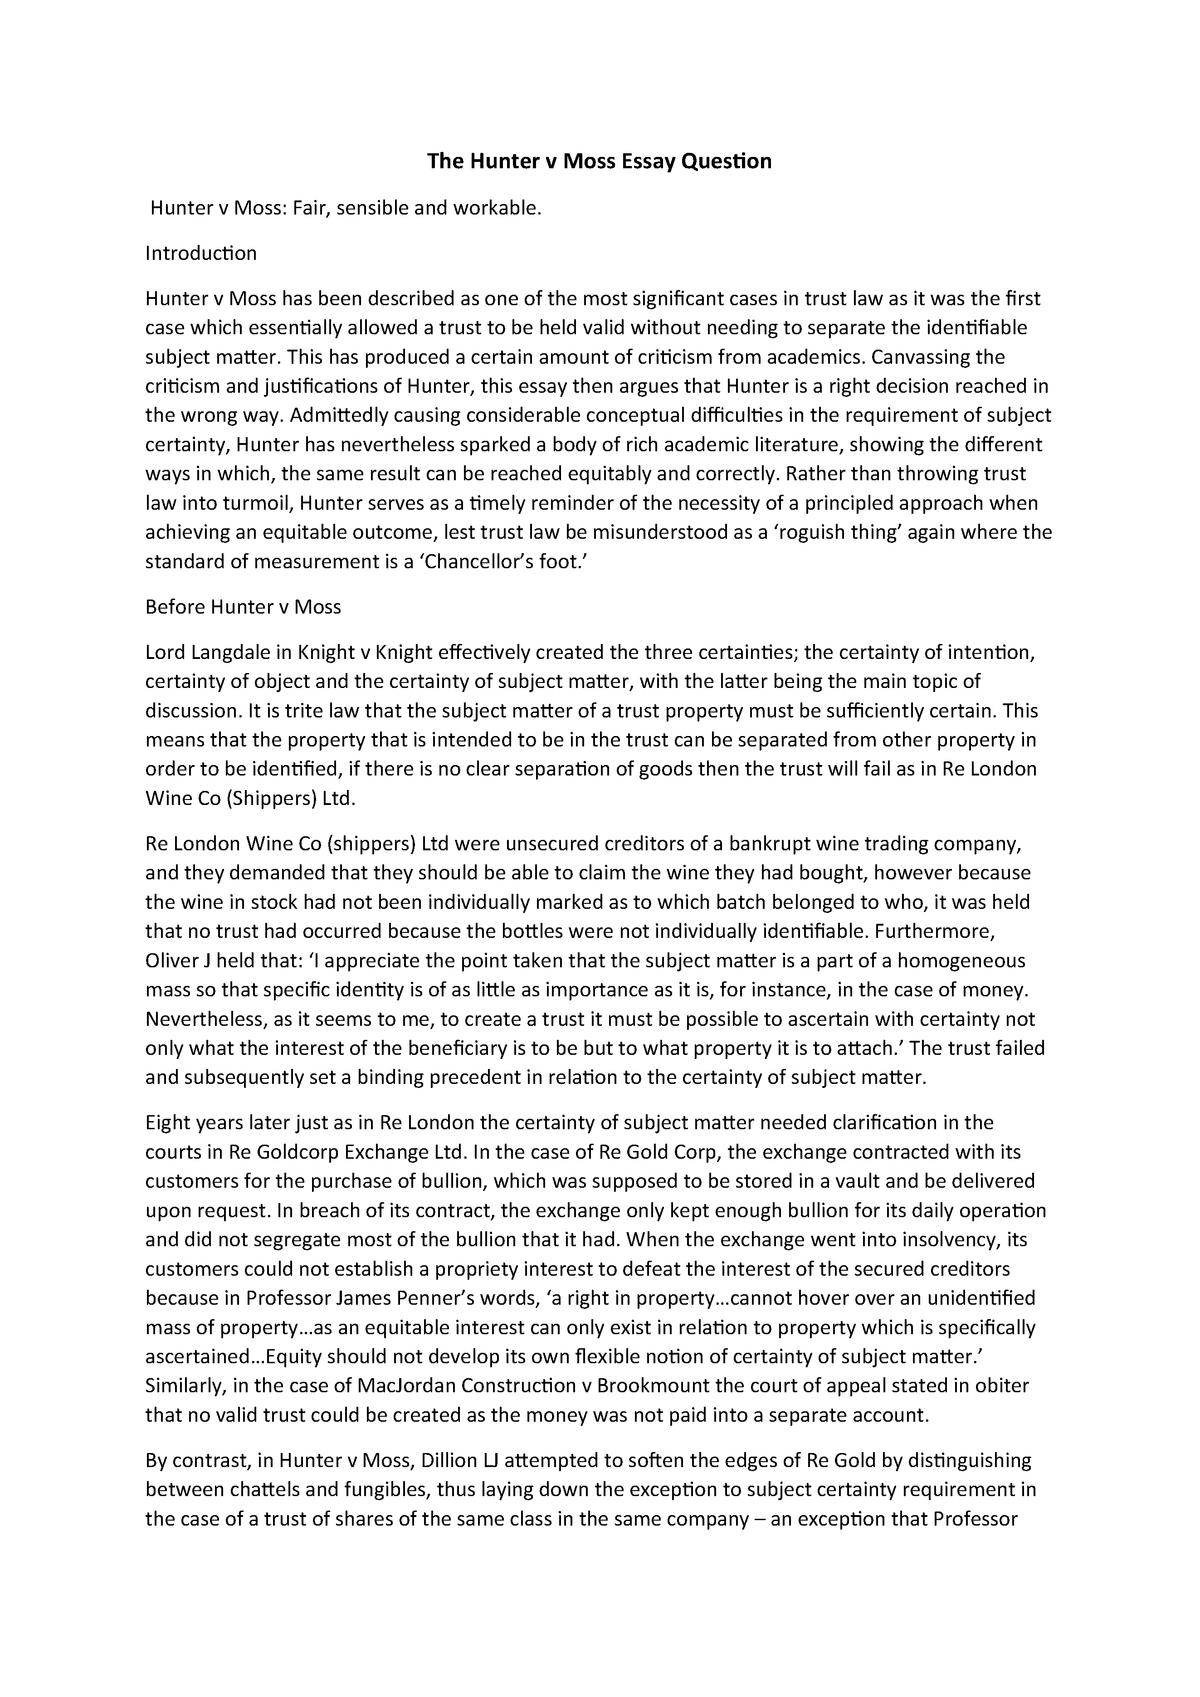 Hunter V Moss Essay - Equity and Trusts Law CL6331 - StuDocu